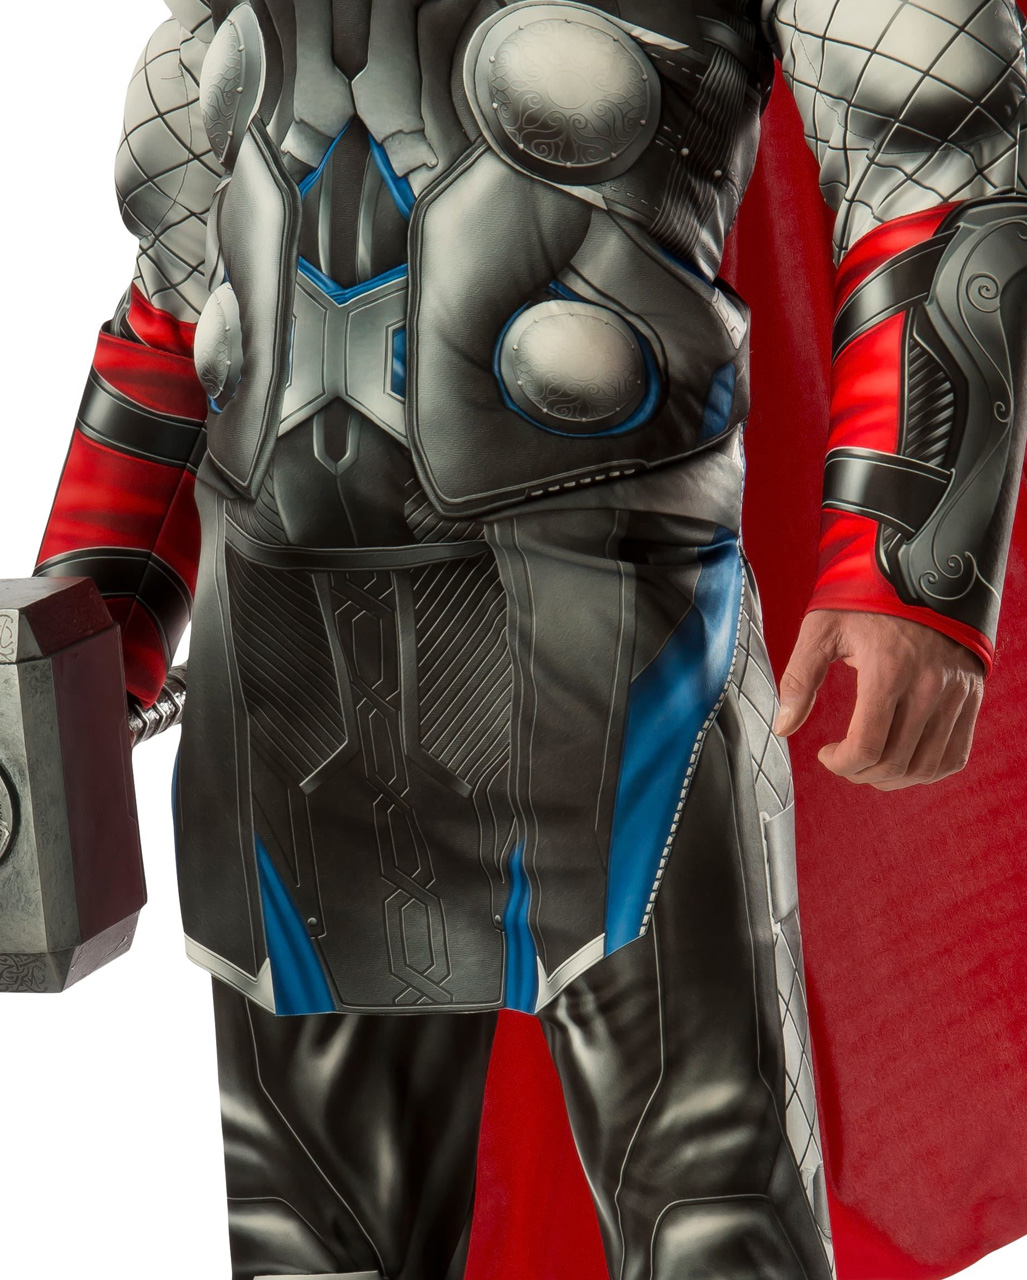 Avengers Thor costume Original Avengers Costumes Buy cheap ...